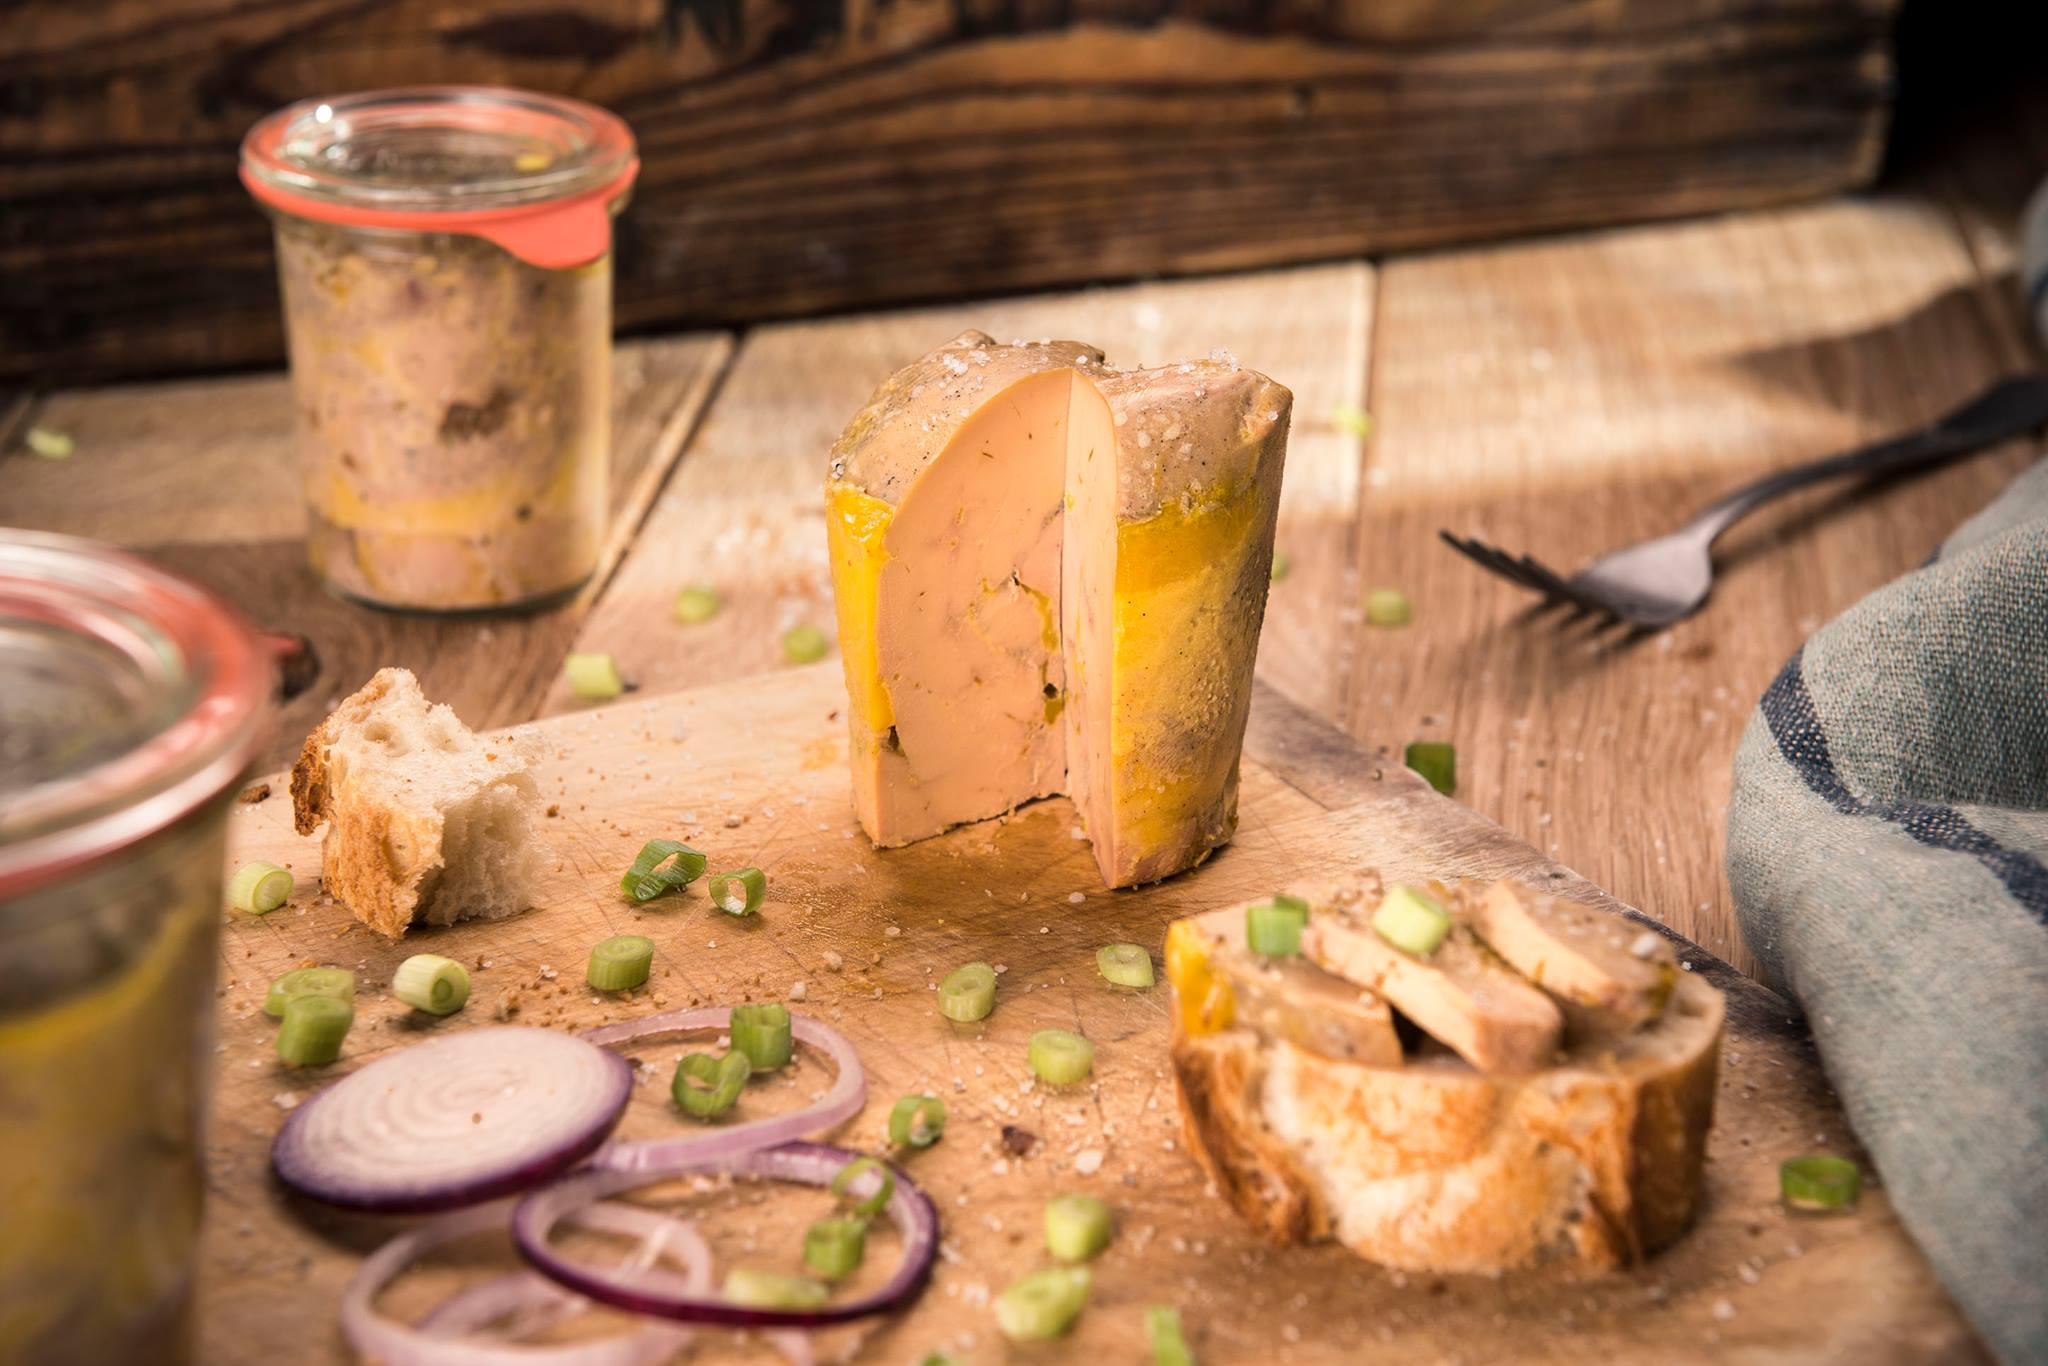 foie gras en bocal weck